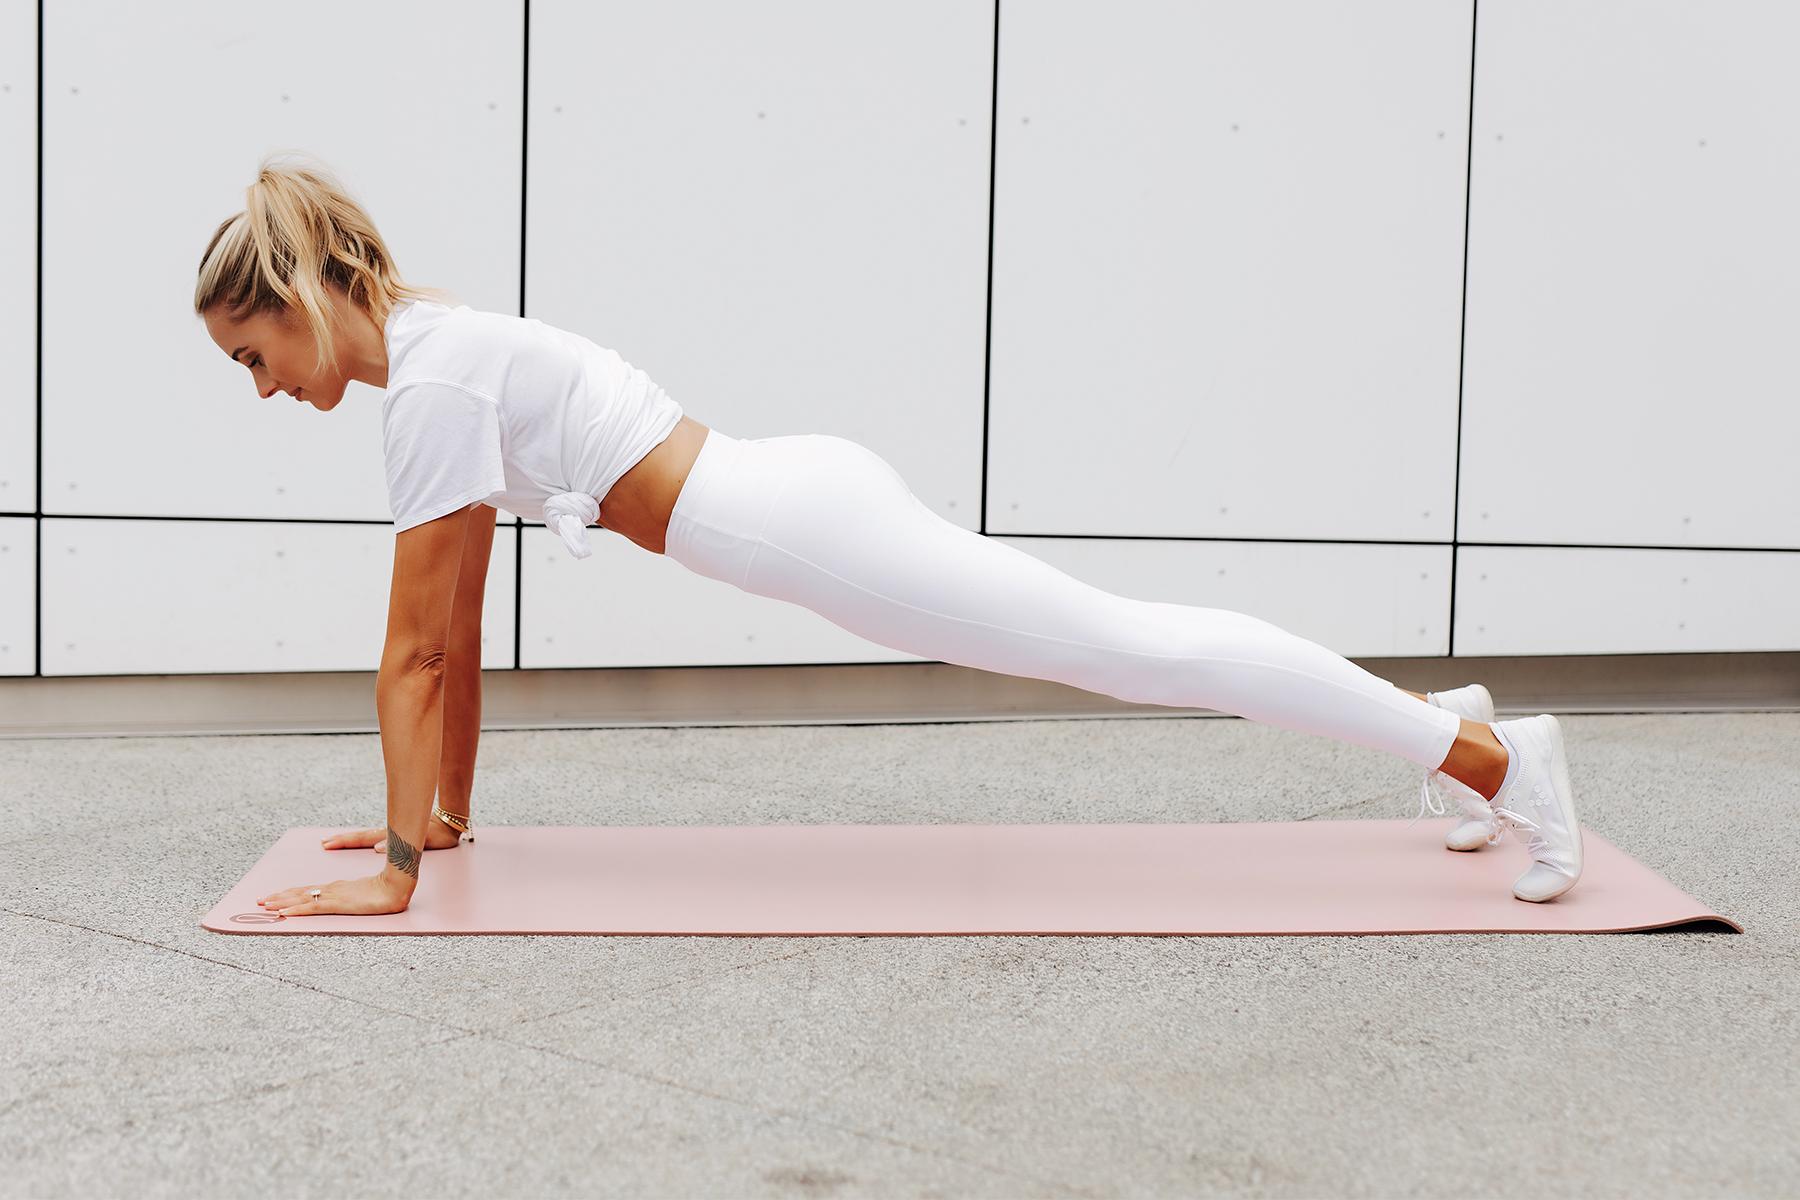 Fashion Jackson Wearing lululemon White Tshirt lululemon White Align Leggings White Sneakers Up Plank Position Simple Ab Exercise